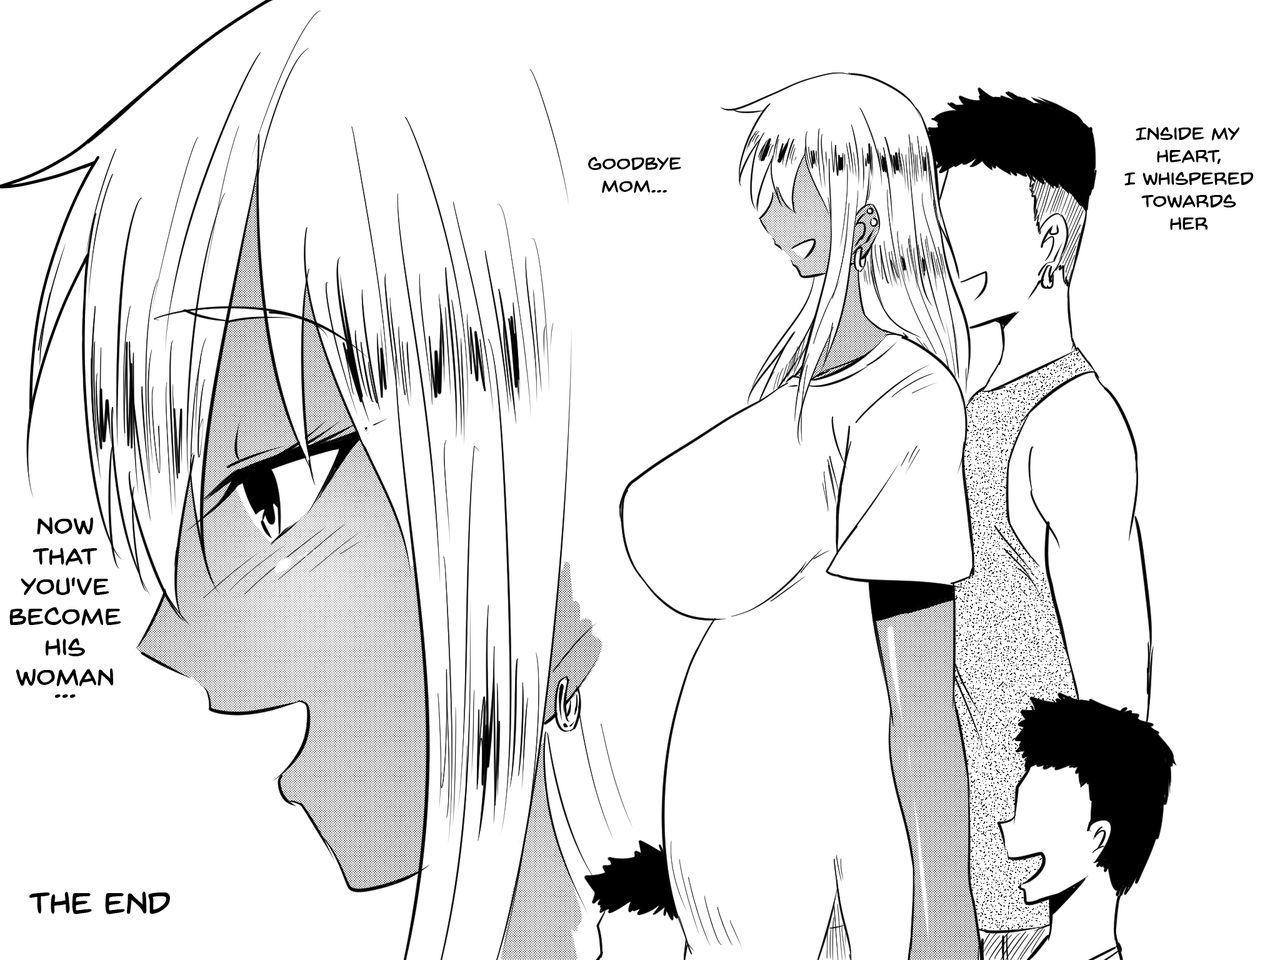 [Mikezoutei] Netorare Haha ~Kachiki de Kimottama no Okaa-san ga Boku o Ijimeru Aitsu no Onna ni Naru Hanashi~   Mom NTR ~A Story Of How My Gutsy Mom Ended Up Becoming My Bully's Plaything~ [English] {Doujins.com} 79